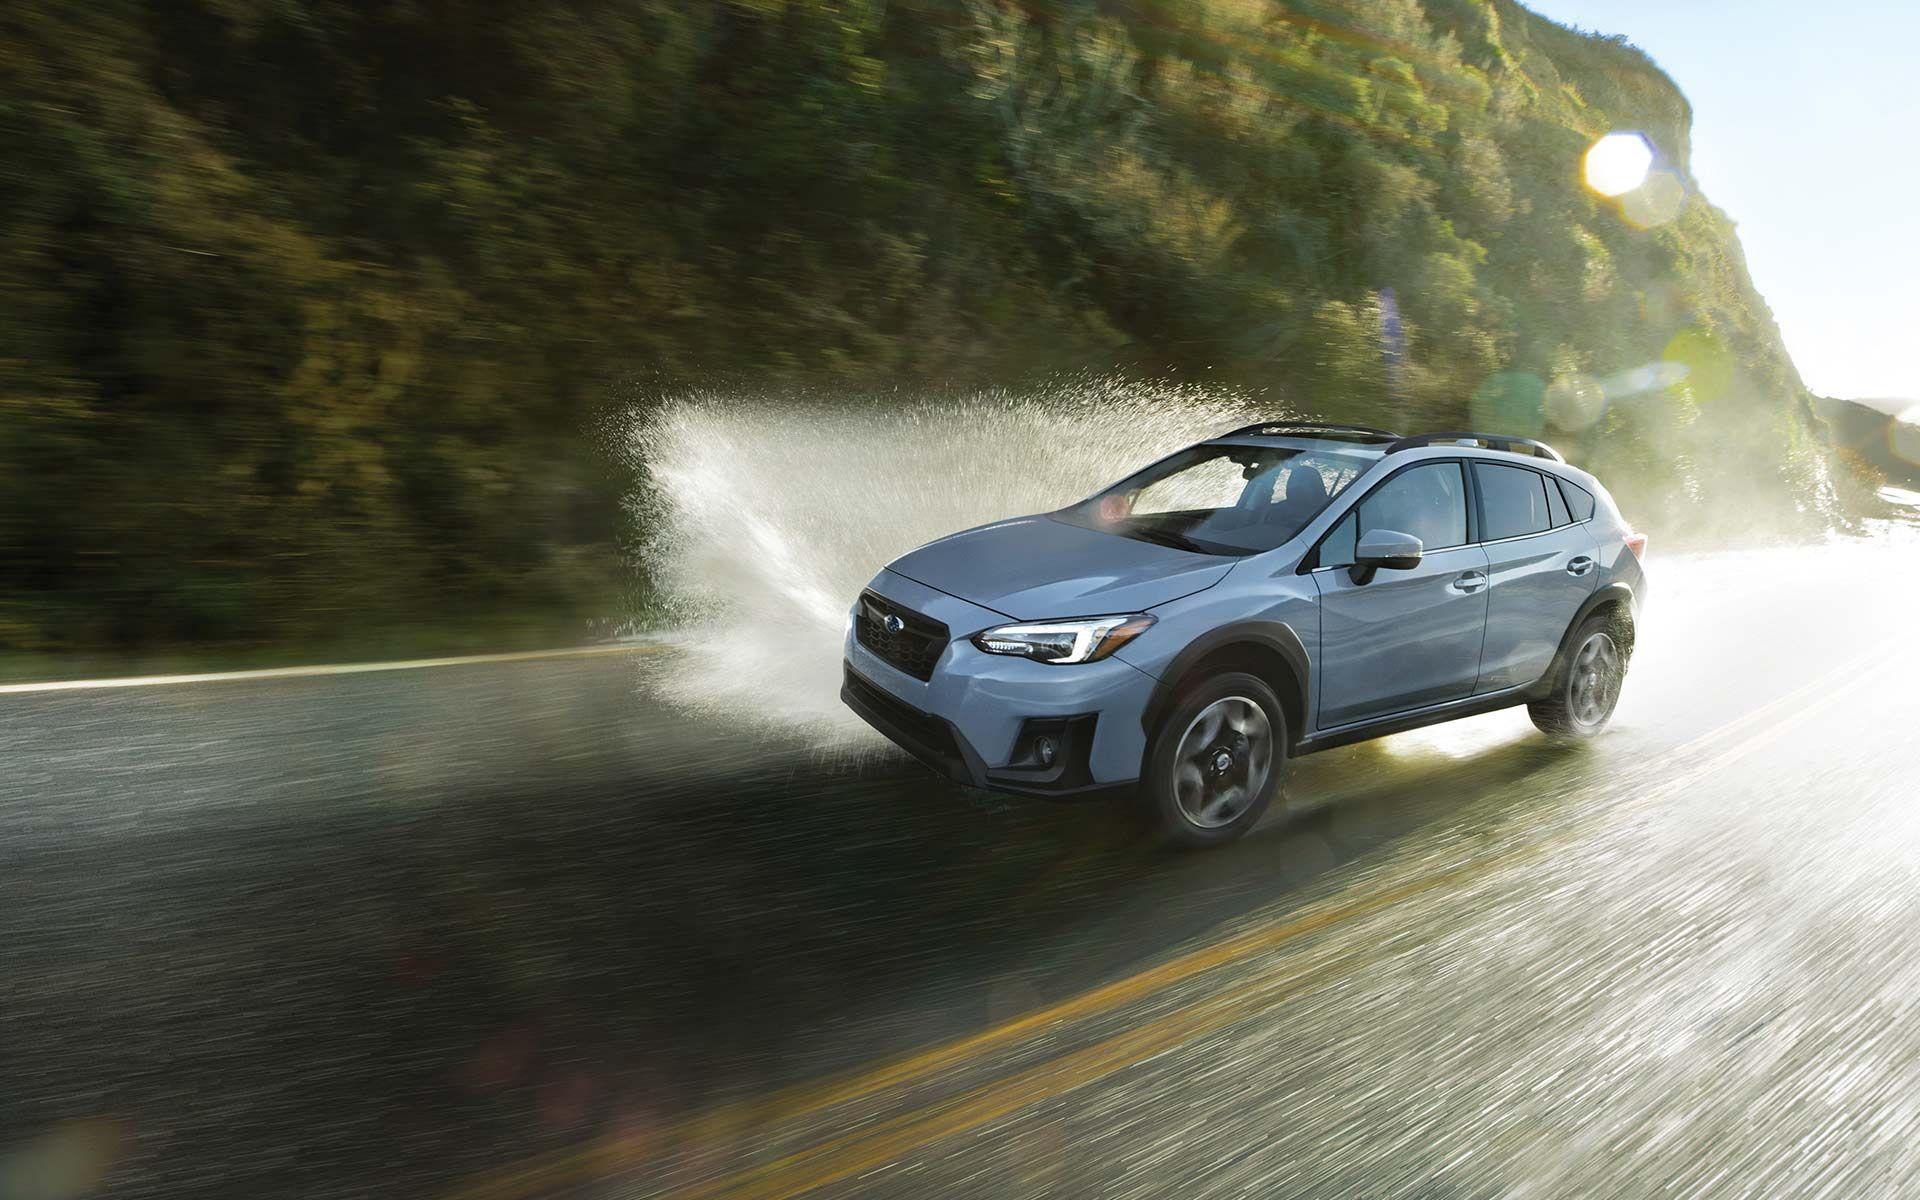 Crosstrek Driving On Wet Roadway Subaru Crosstrek